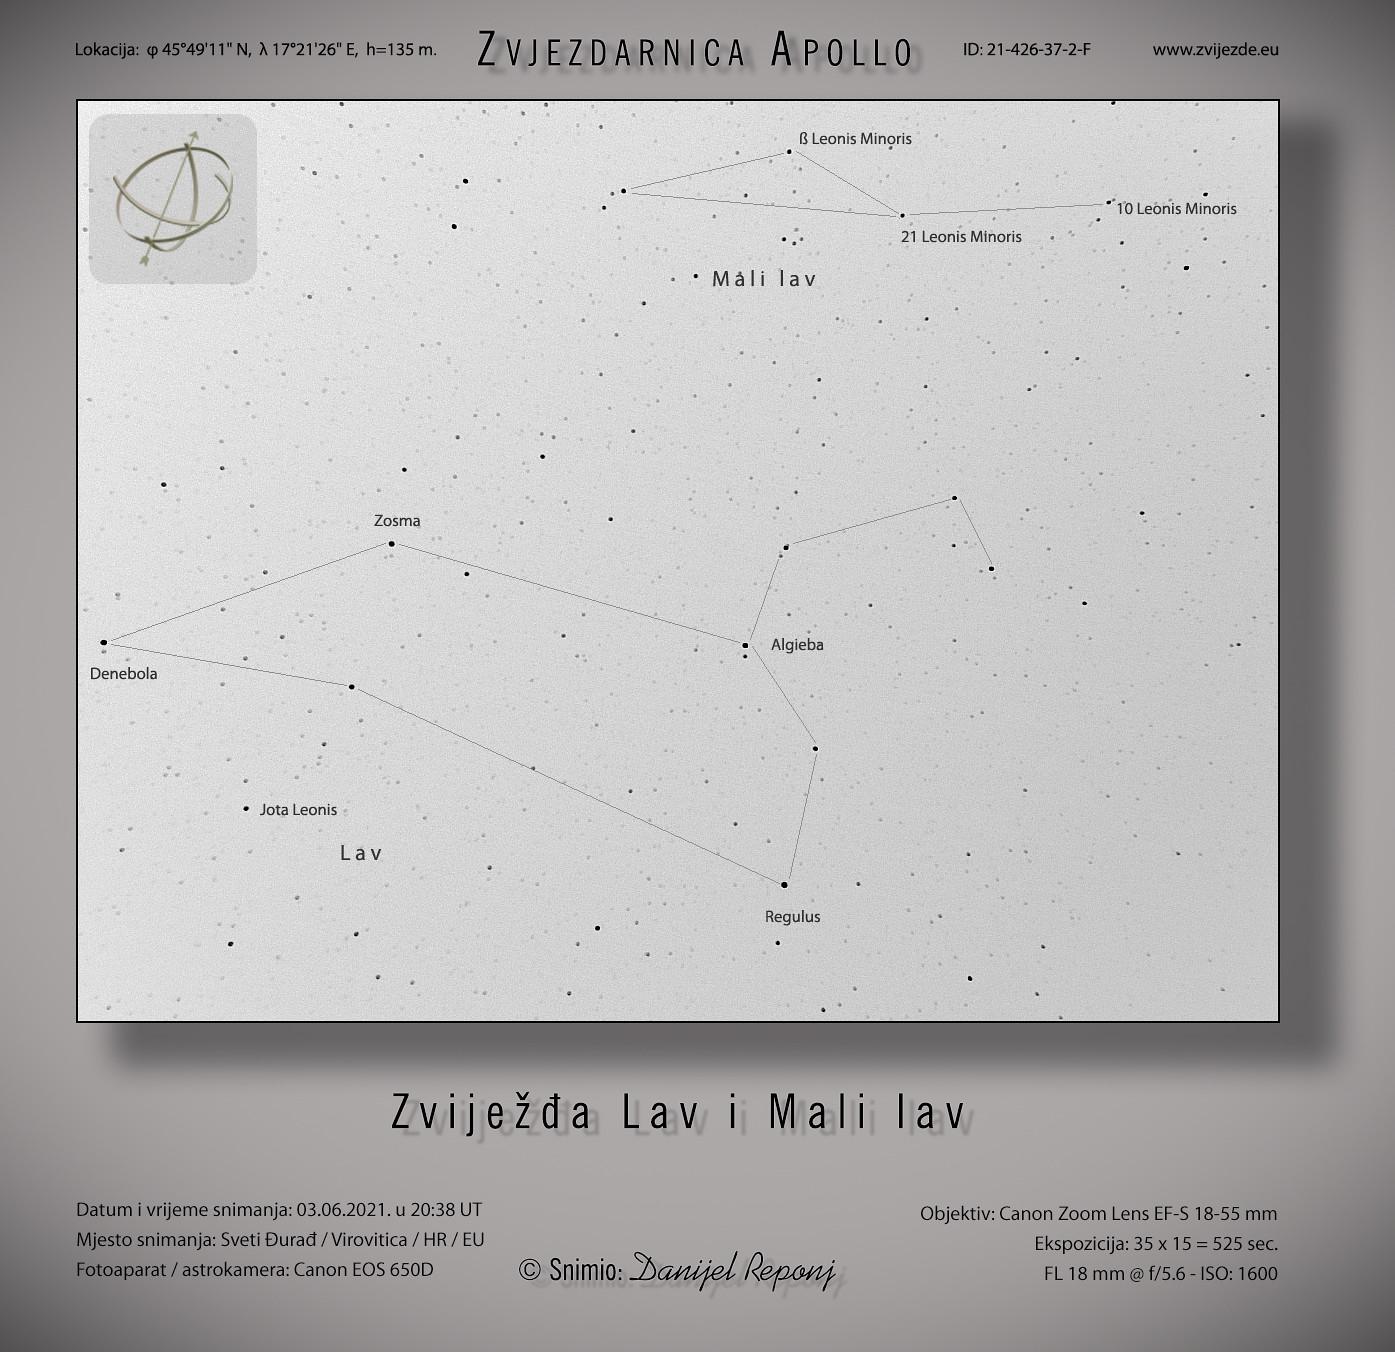 Zviježđa Lav i Mali lav, 3.6.2021.